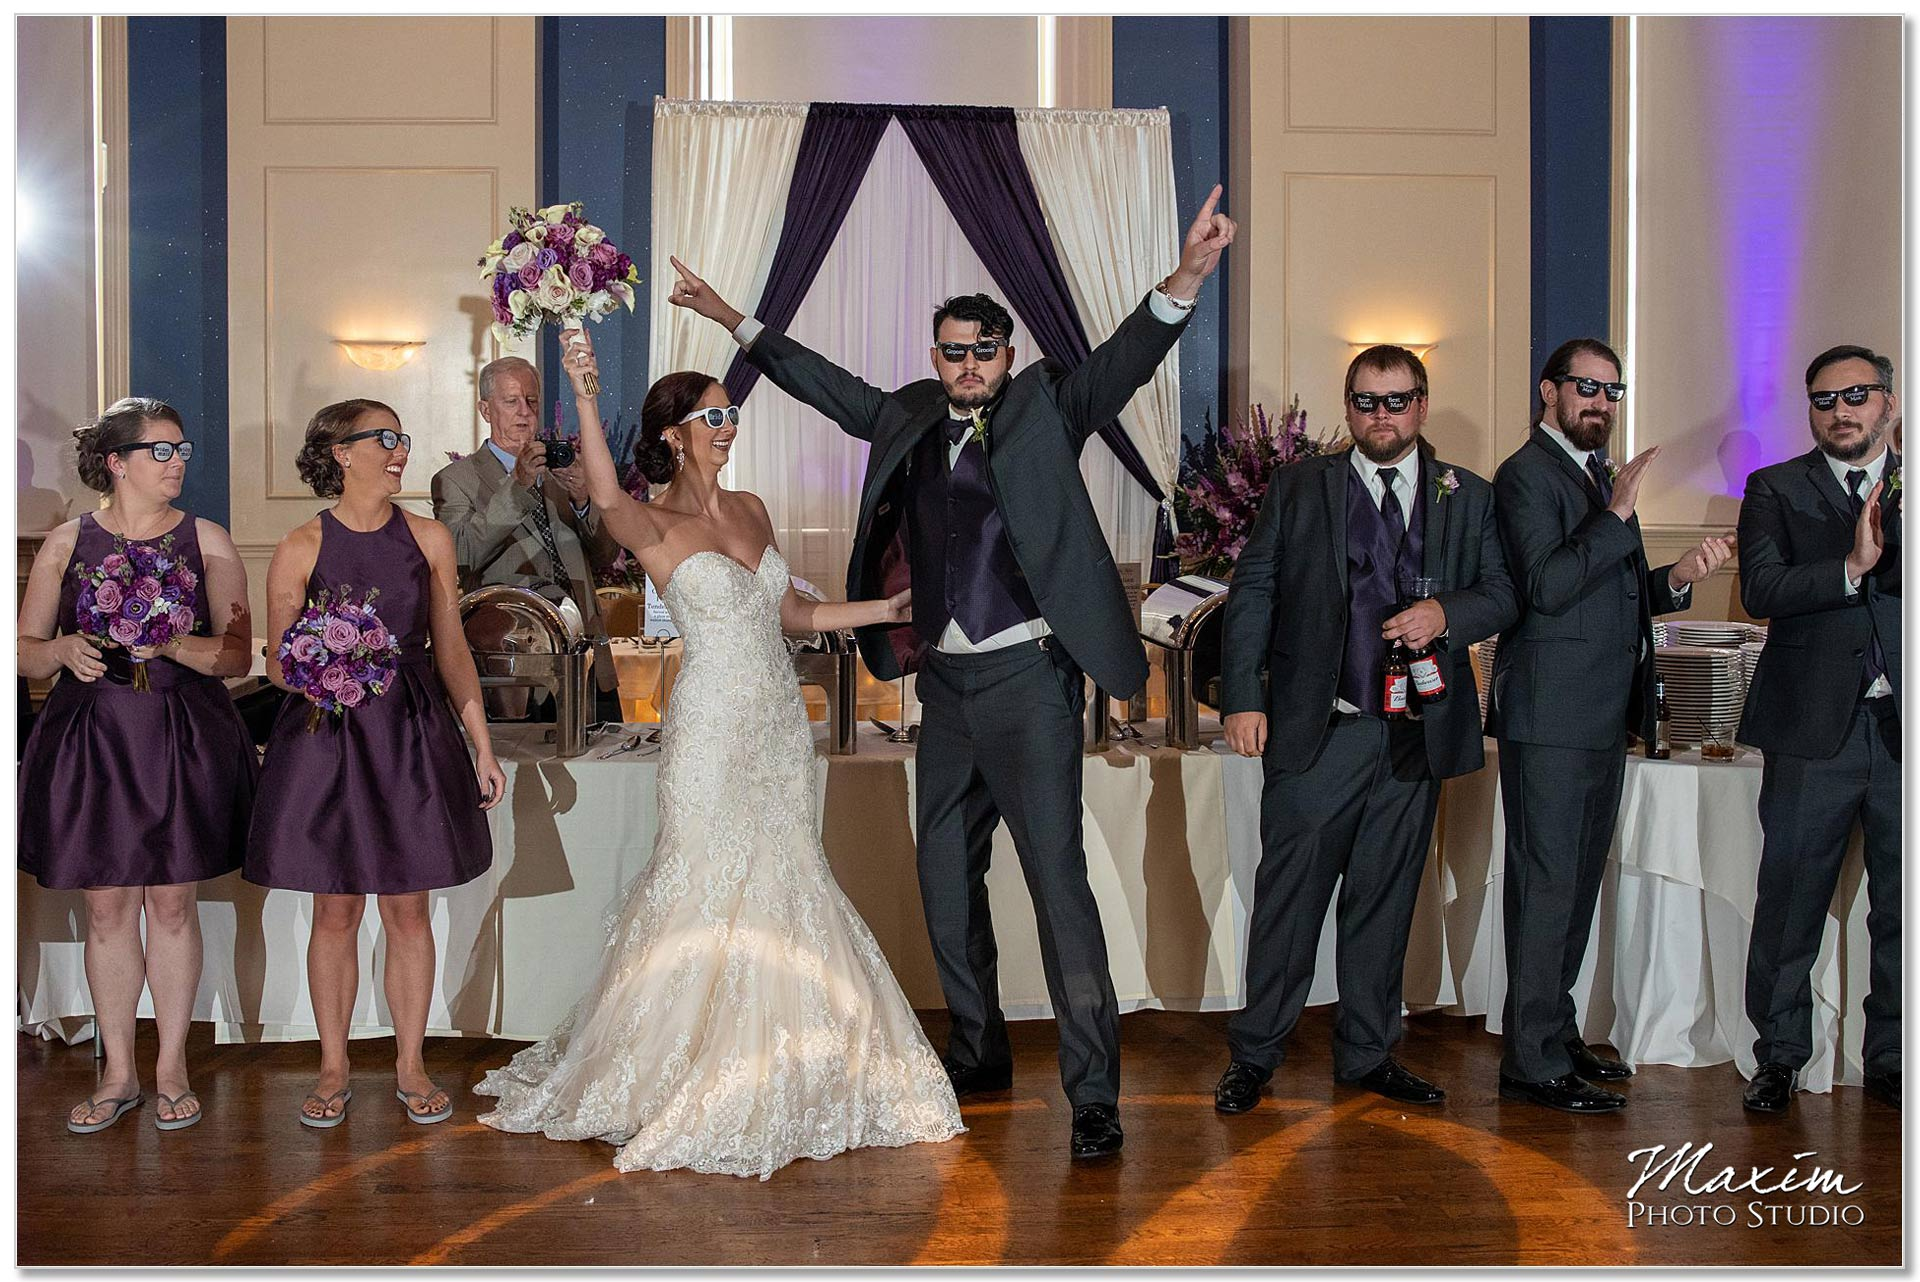 The Grand Wedding Reception Bride Groom